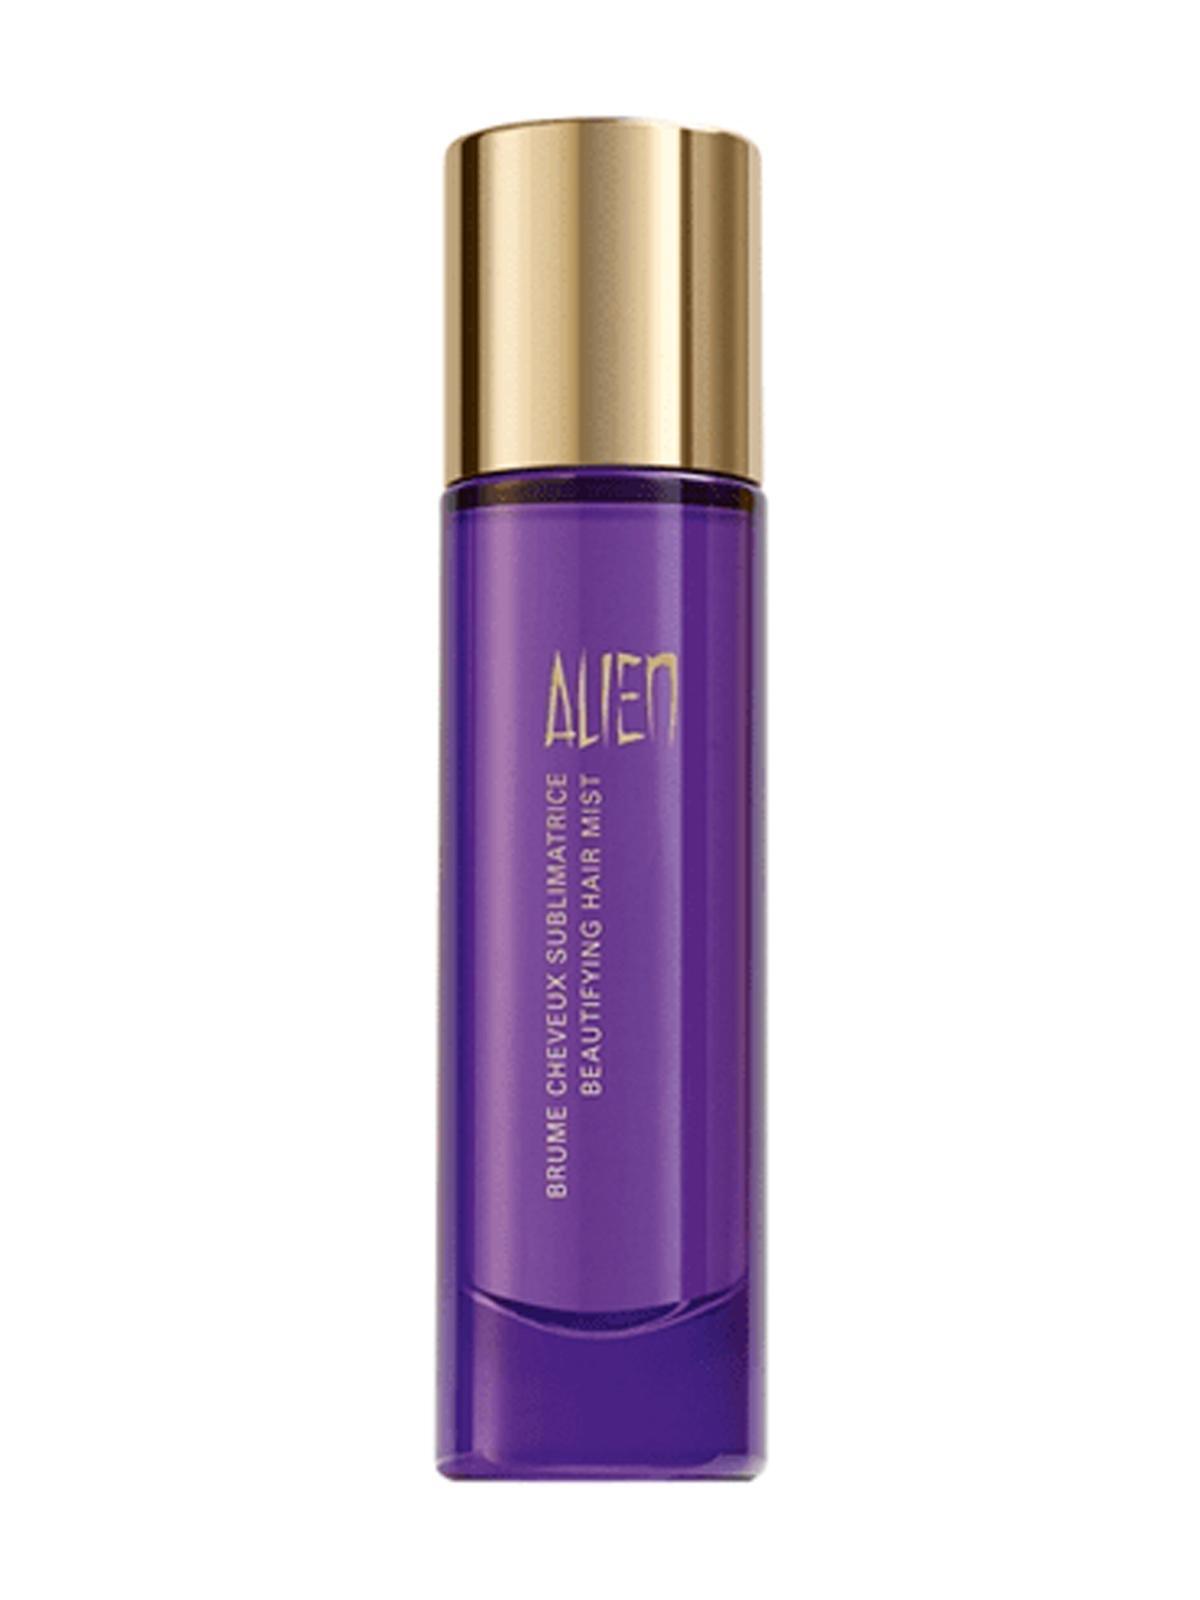 Thierry Mugler Alien For Women Hair Mist 35ML